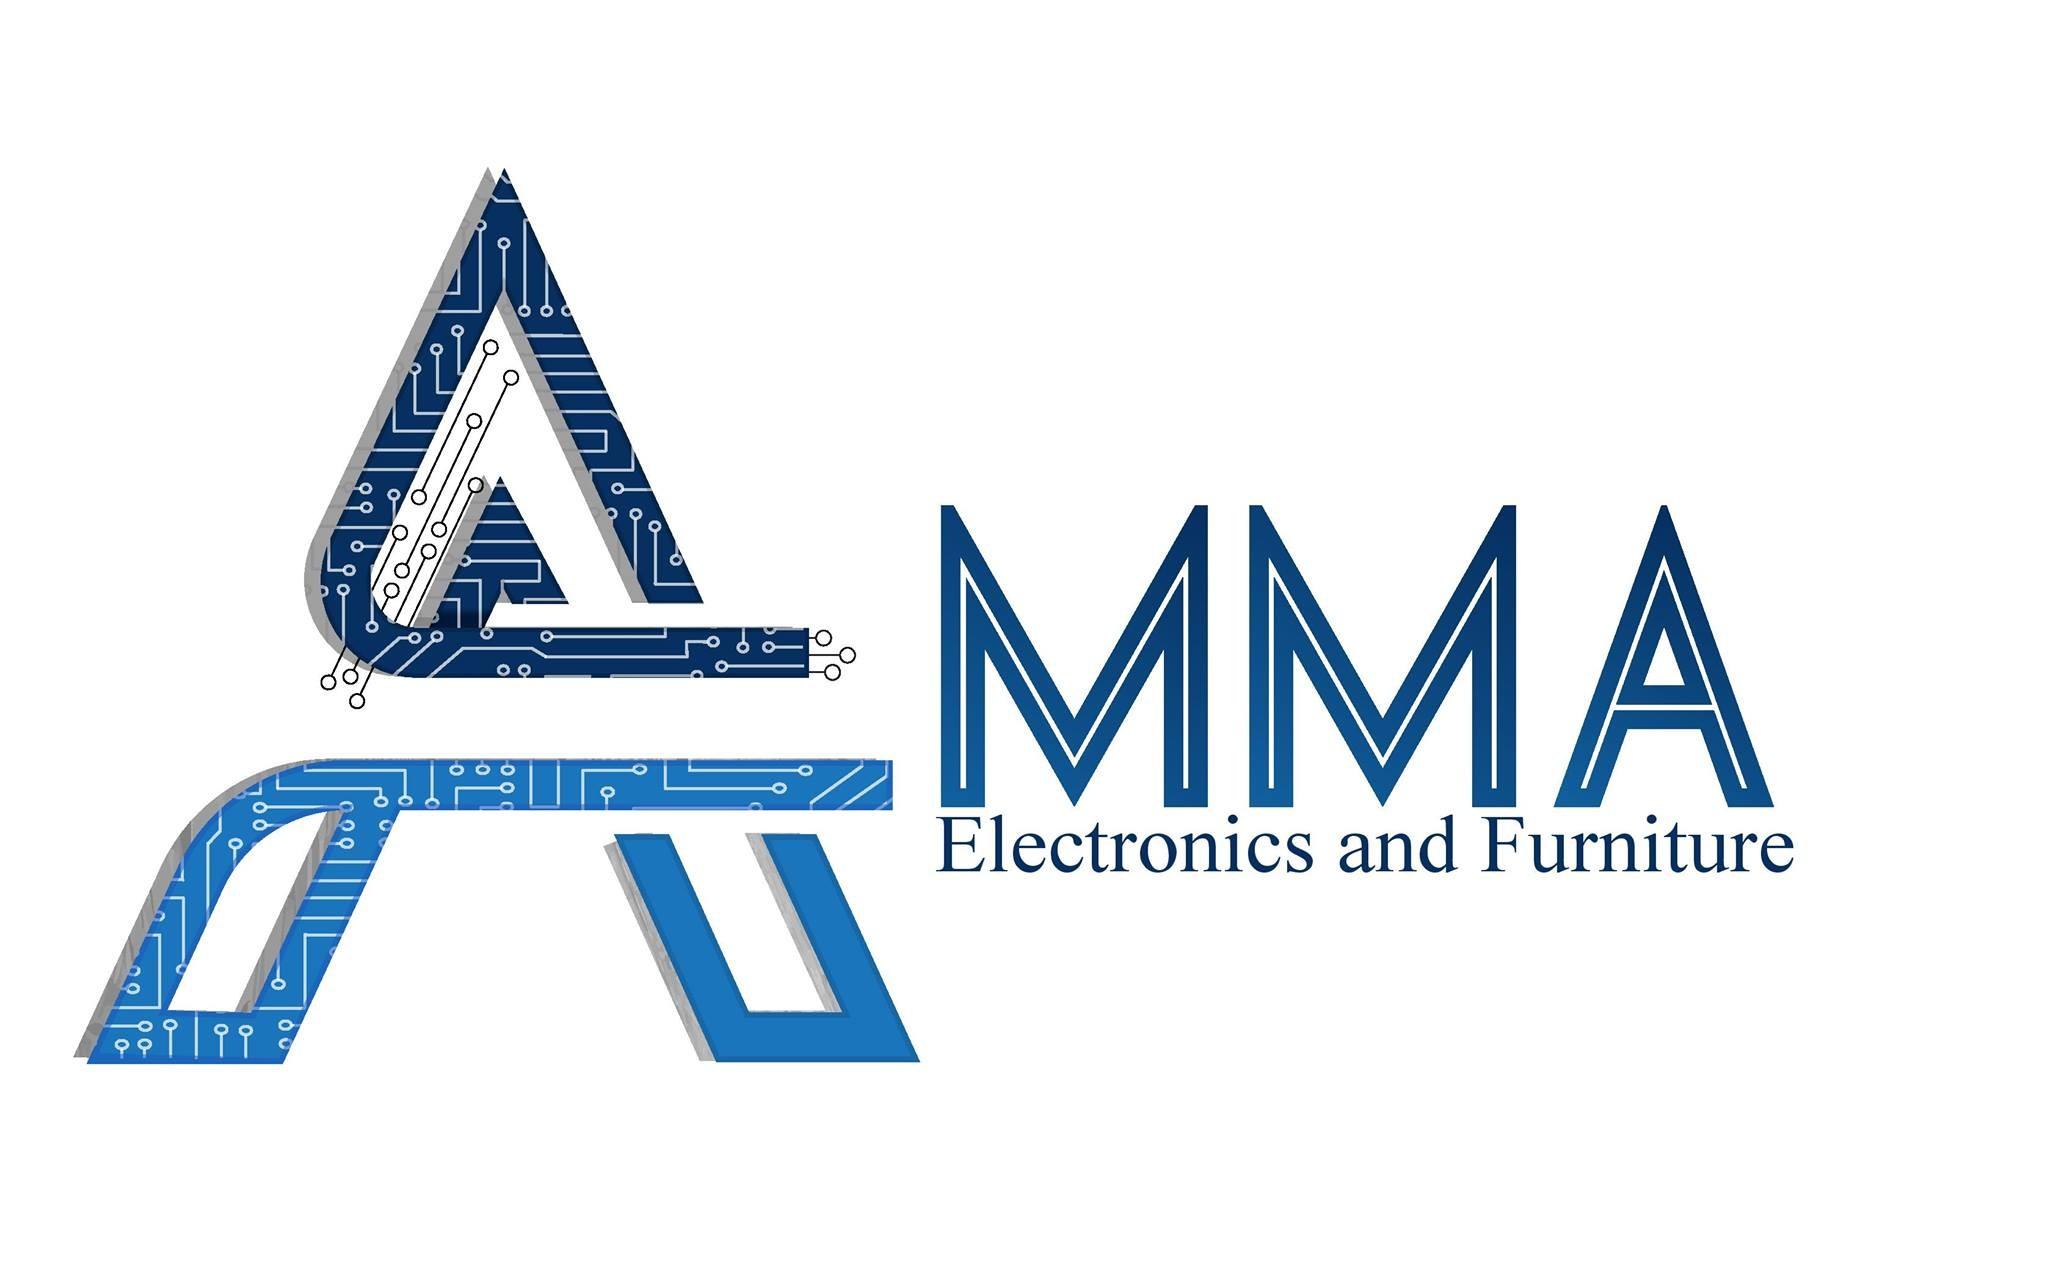 Amma Electronics